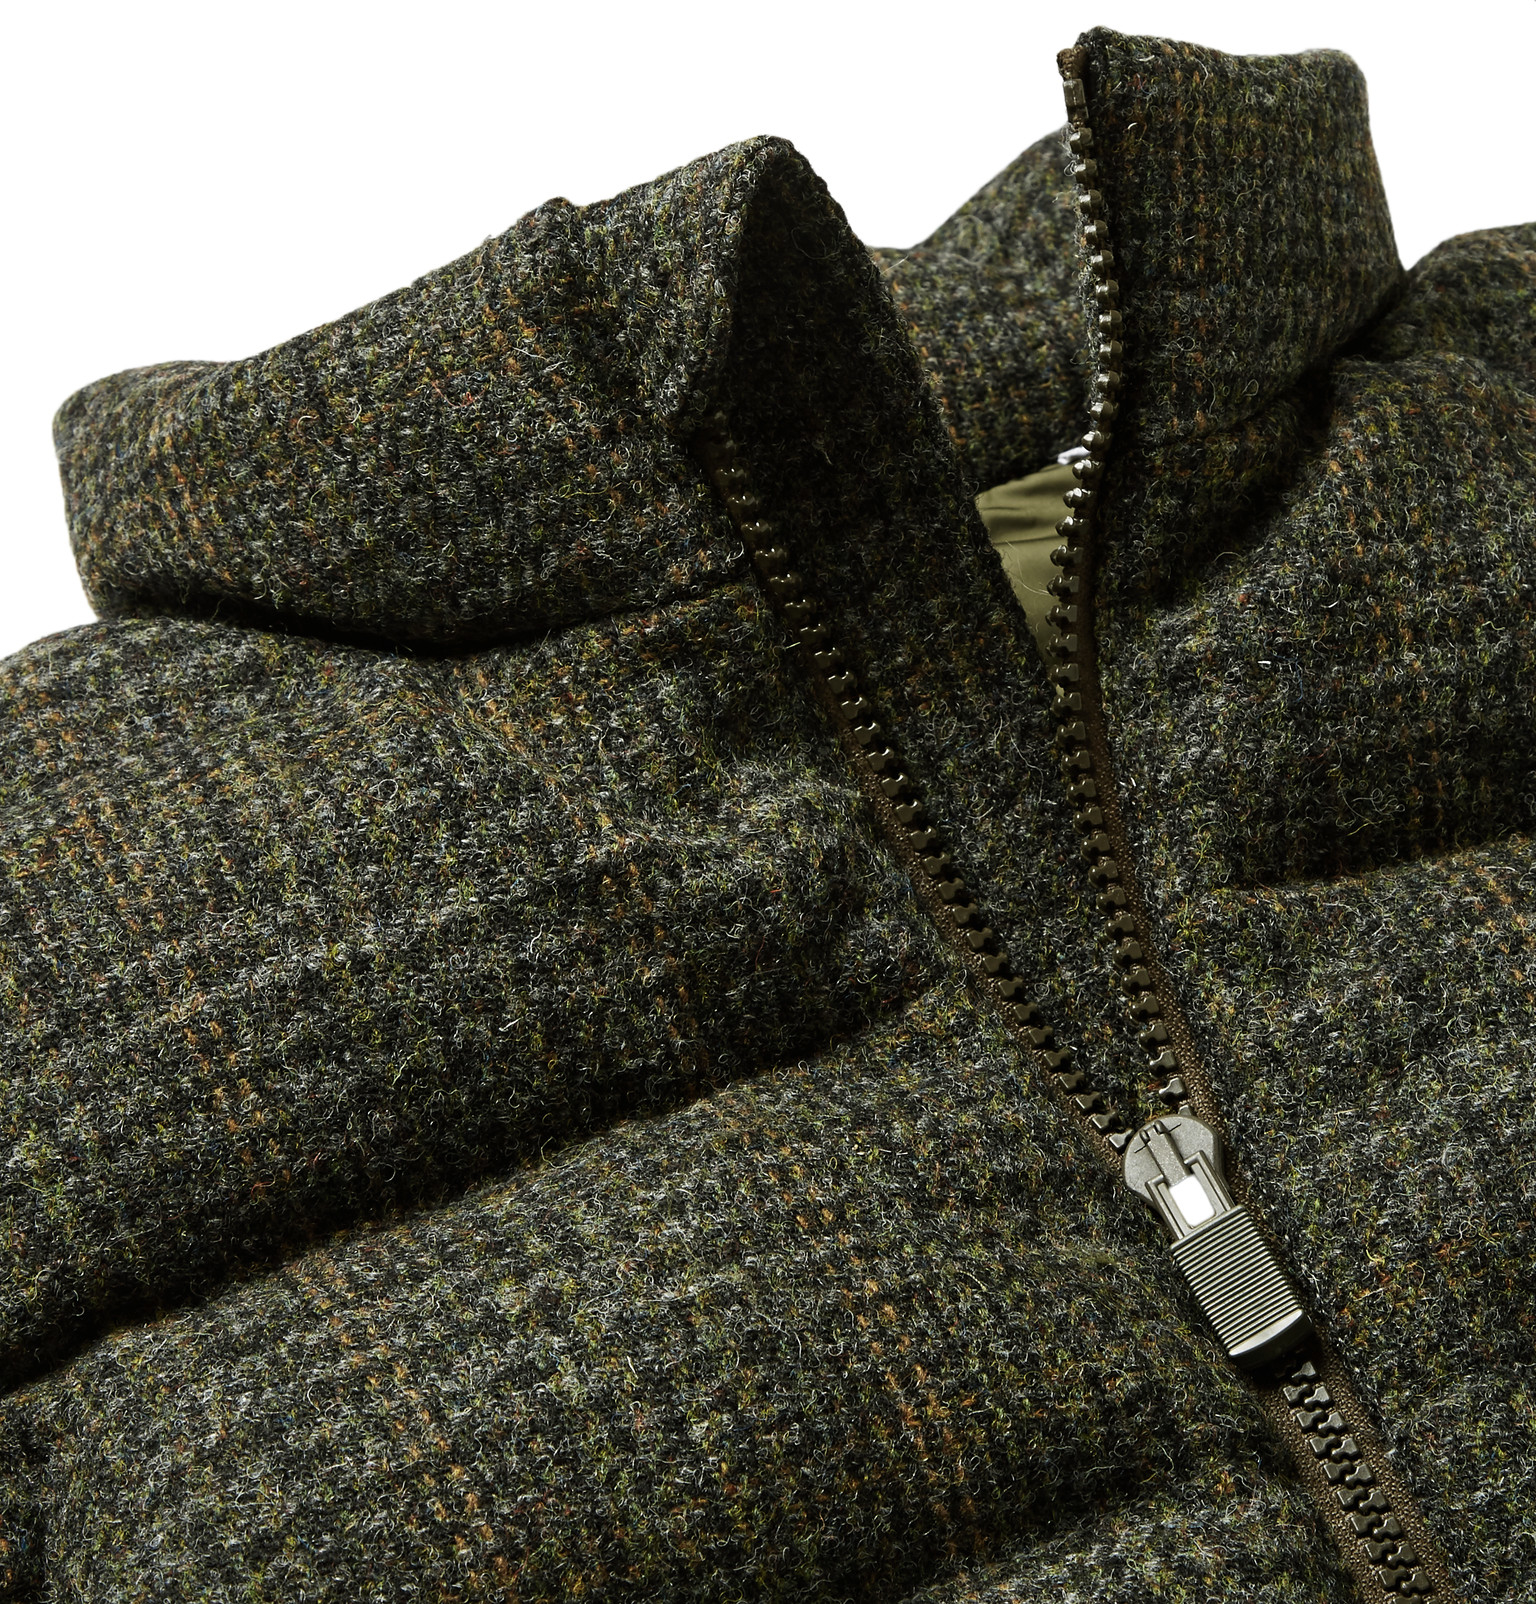 aspesi-dark-green-quilted-checked-harris-wool-tweed-down-gilet-green-product-5-824689911-normal.jpeg